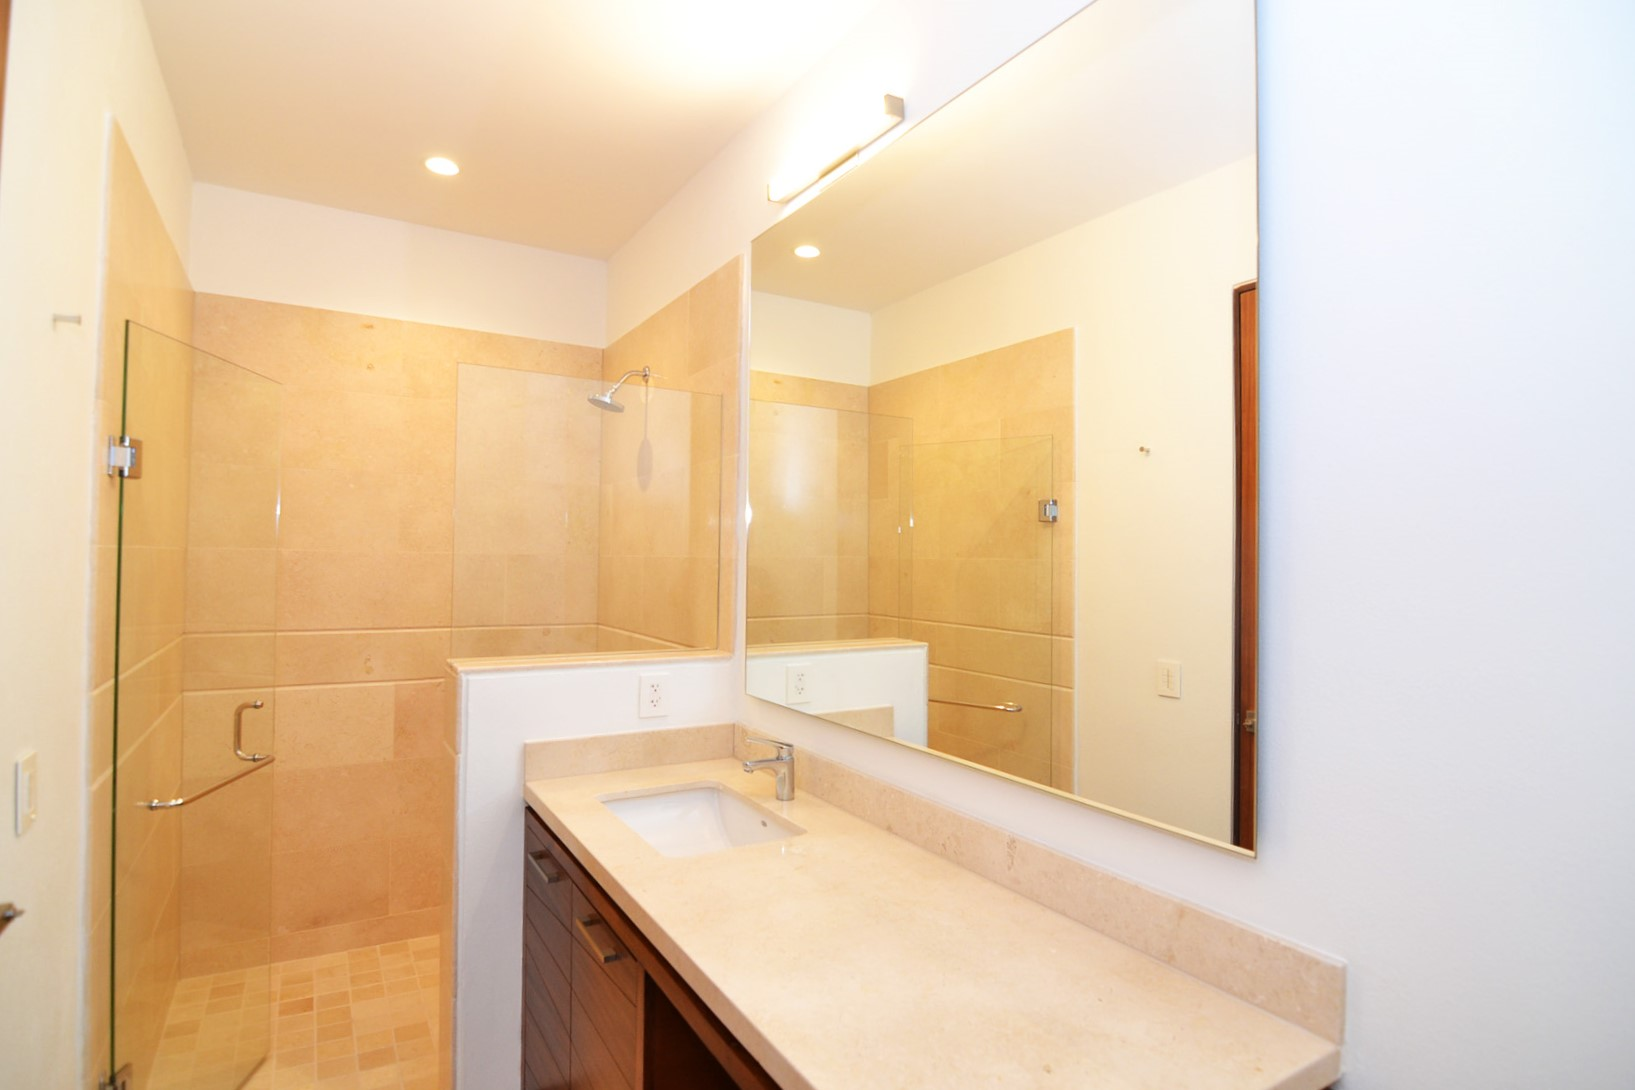 Condo VMarina PH10 - Puerto Vallarta Luxury Condo For Rent (8)